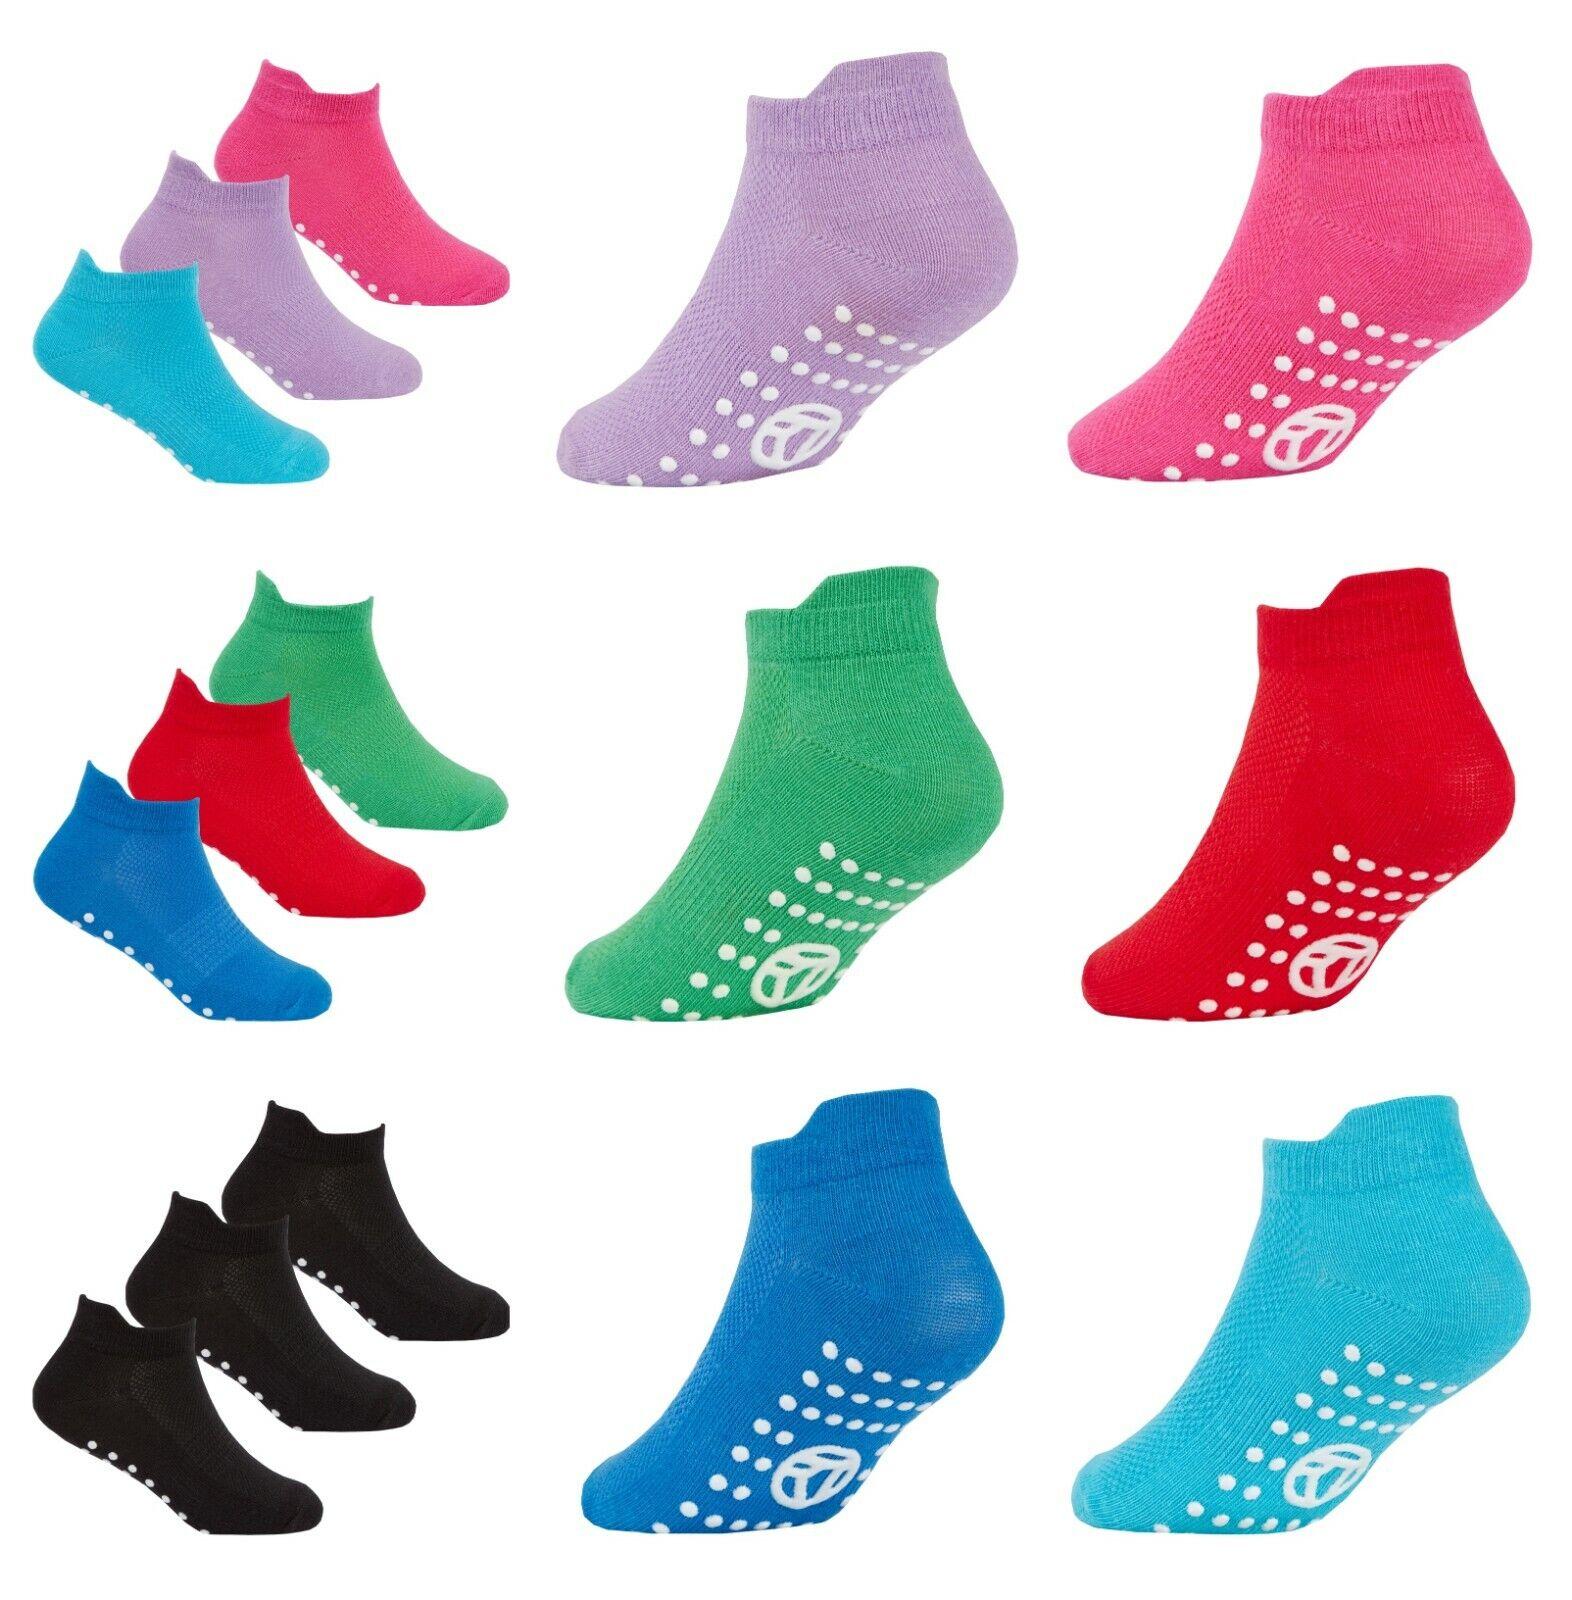 Kids Trainer Socks Gripper Sole Ideal For Soft Play Trampoli